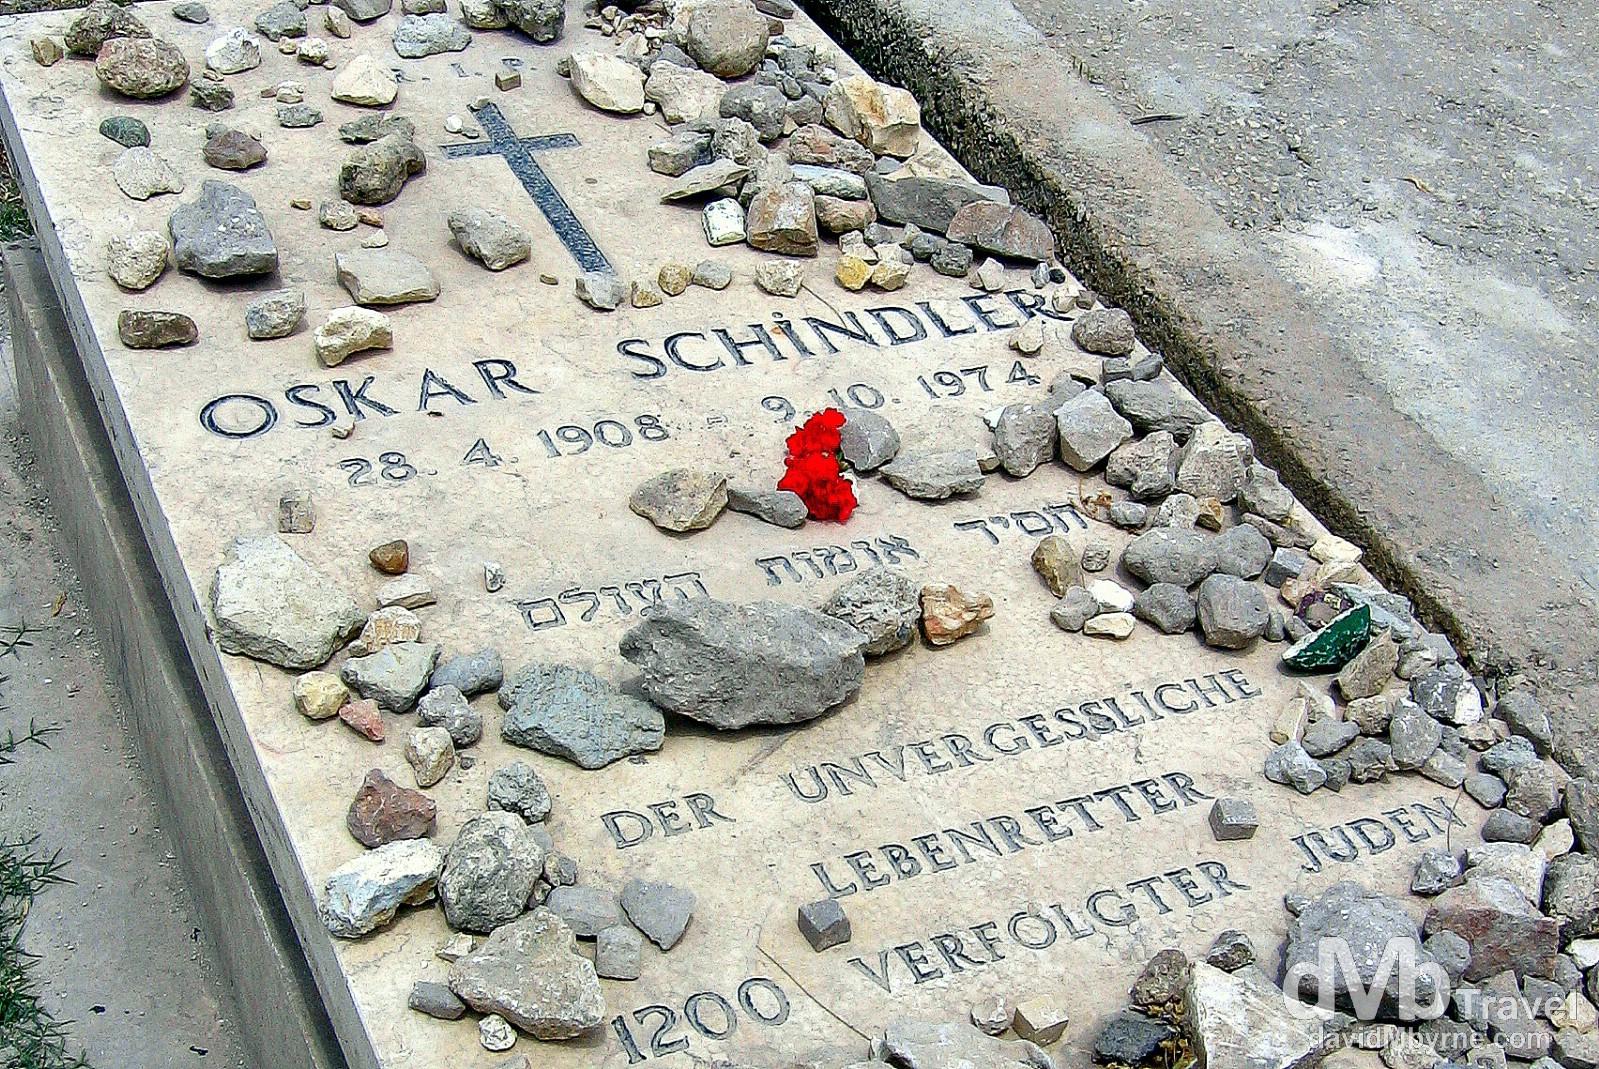 Oskar Schindler's grave in Mount Zion Catholic Cemetery, Jerusalem, Israel. May 1, 2008.